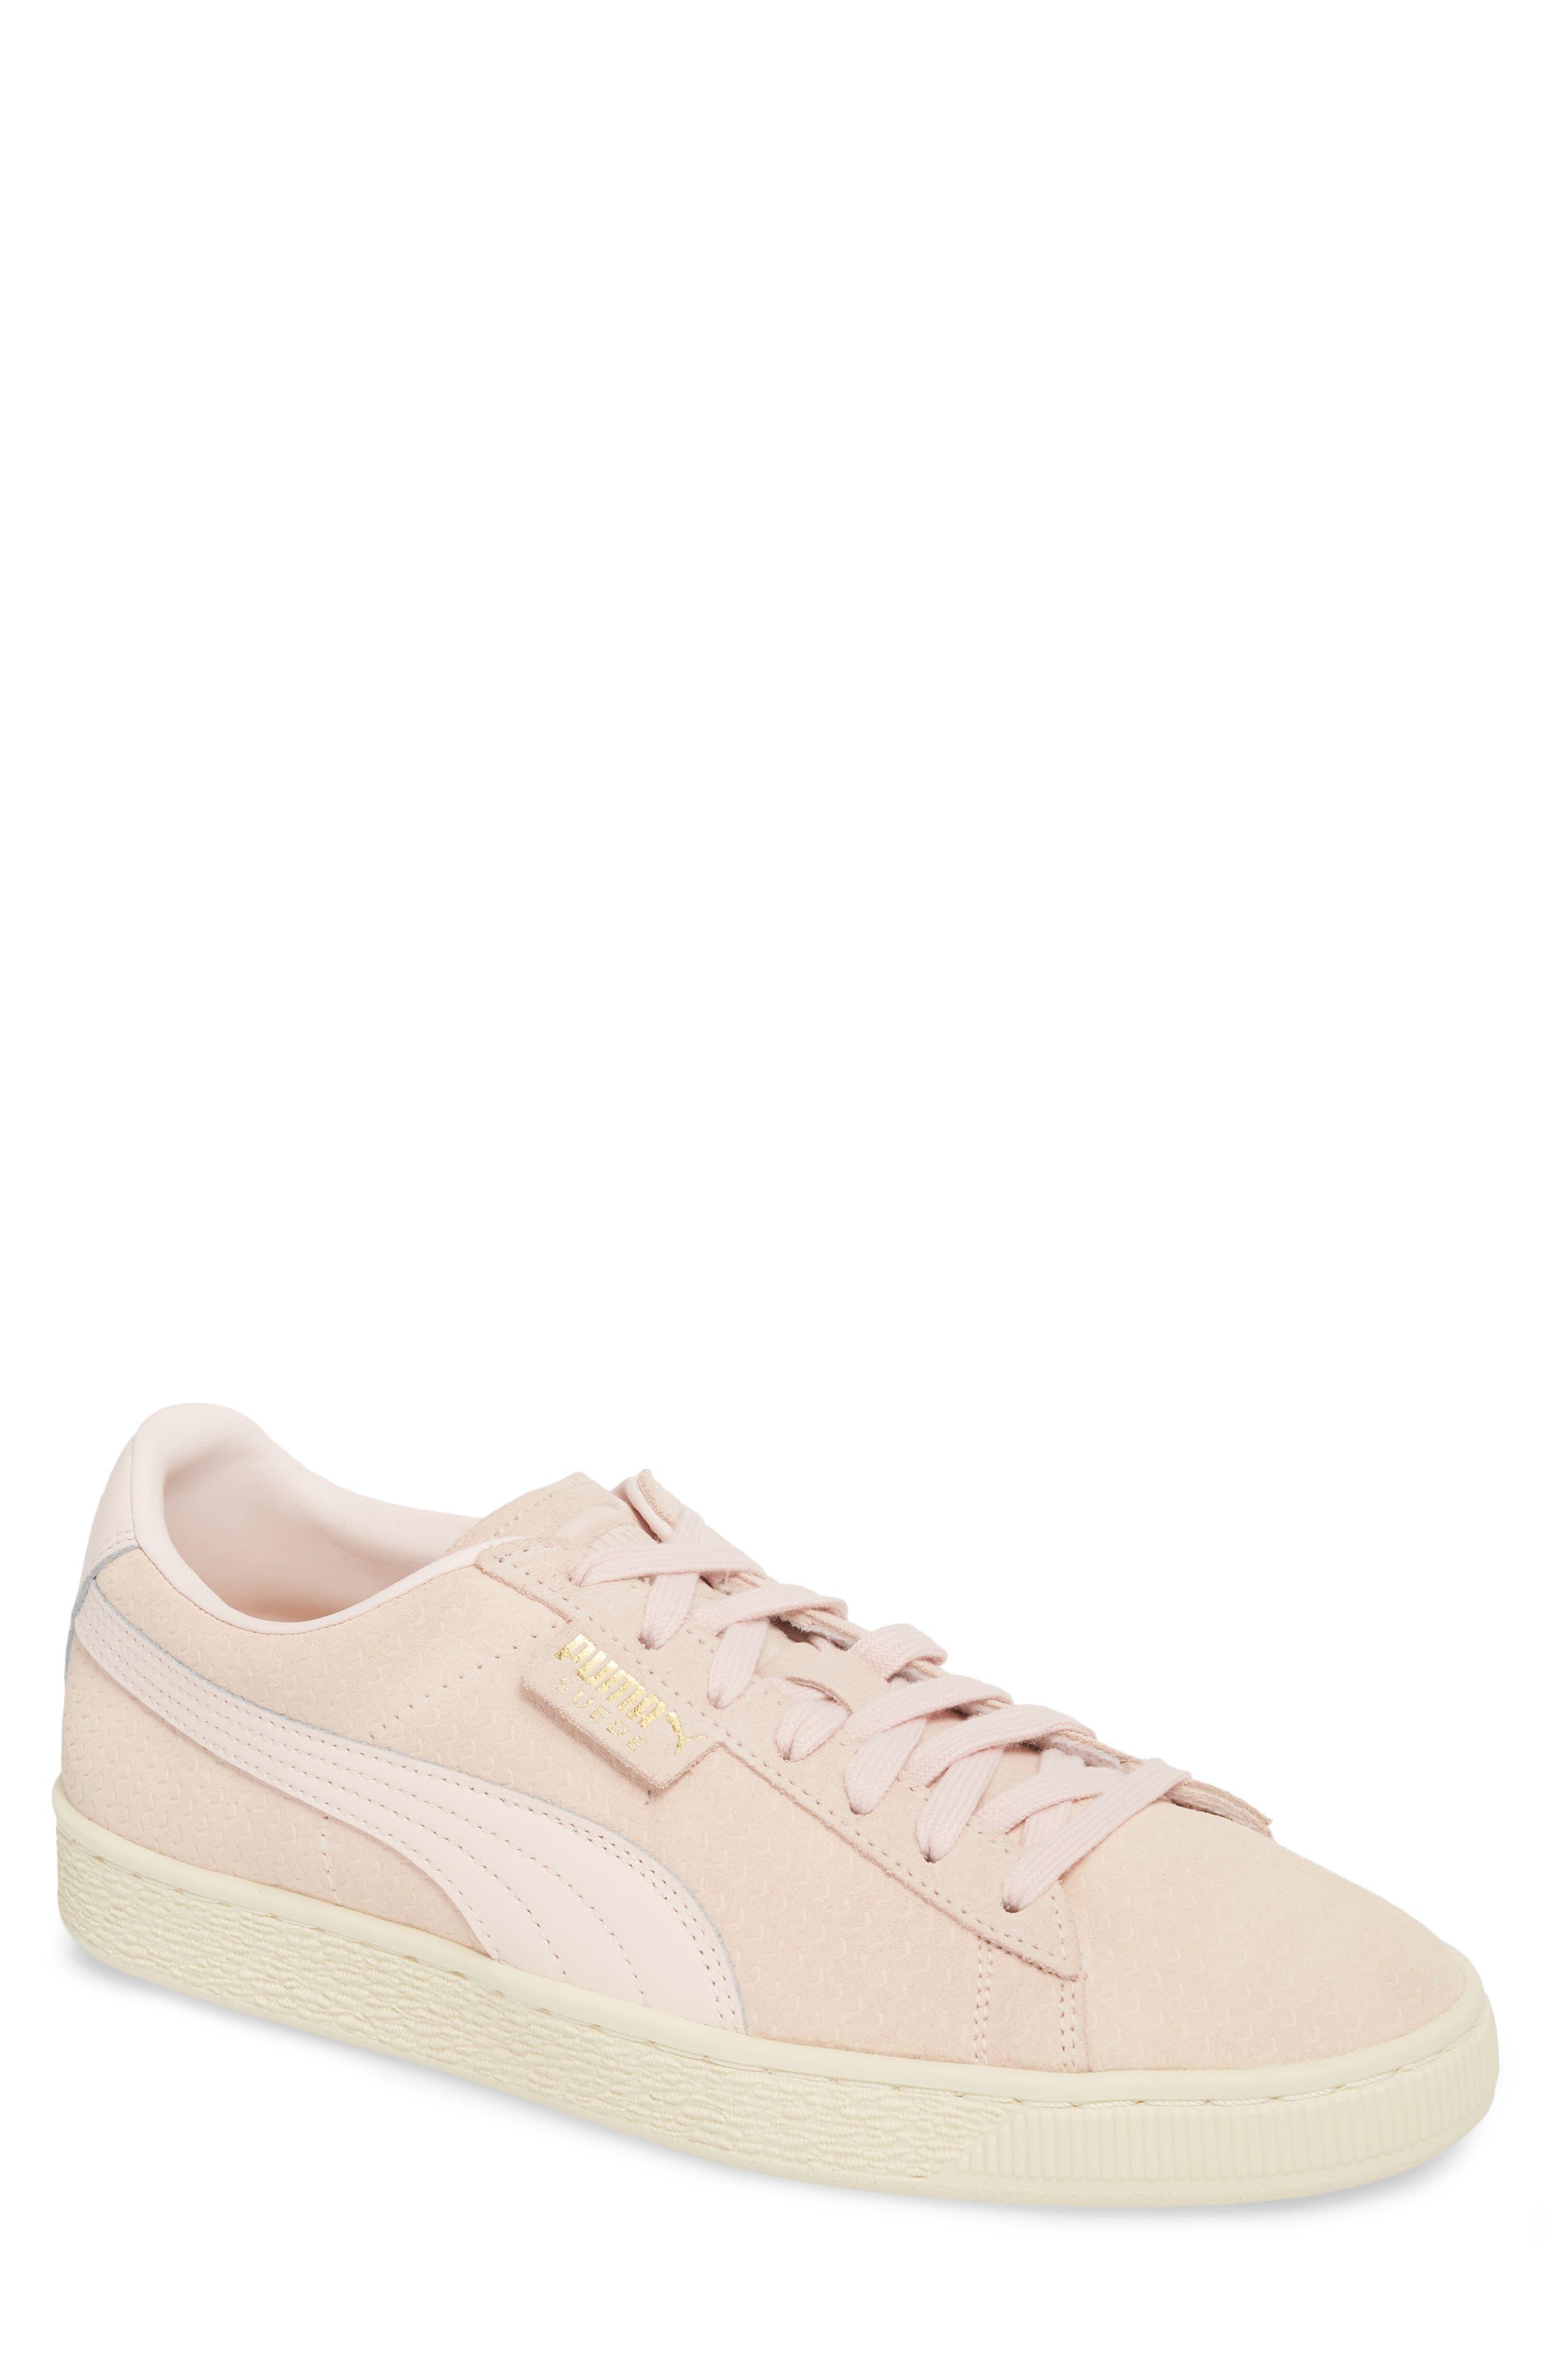 PUMA Suede Classic Perforation Sneaker (Men)